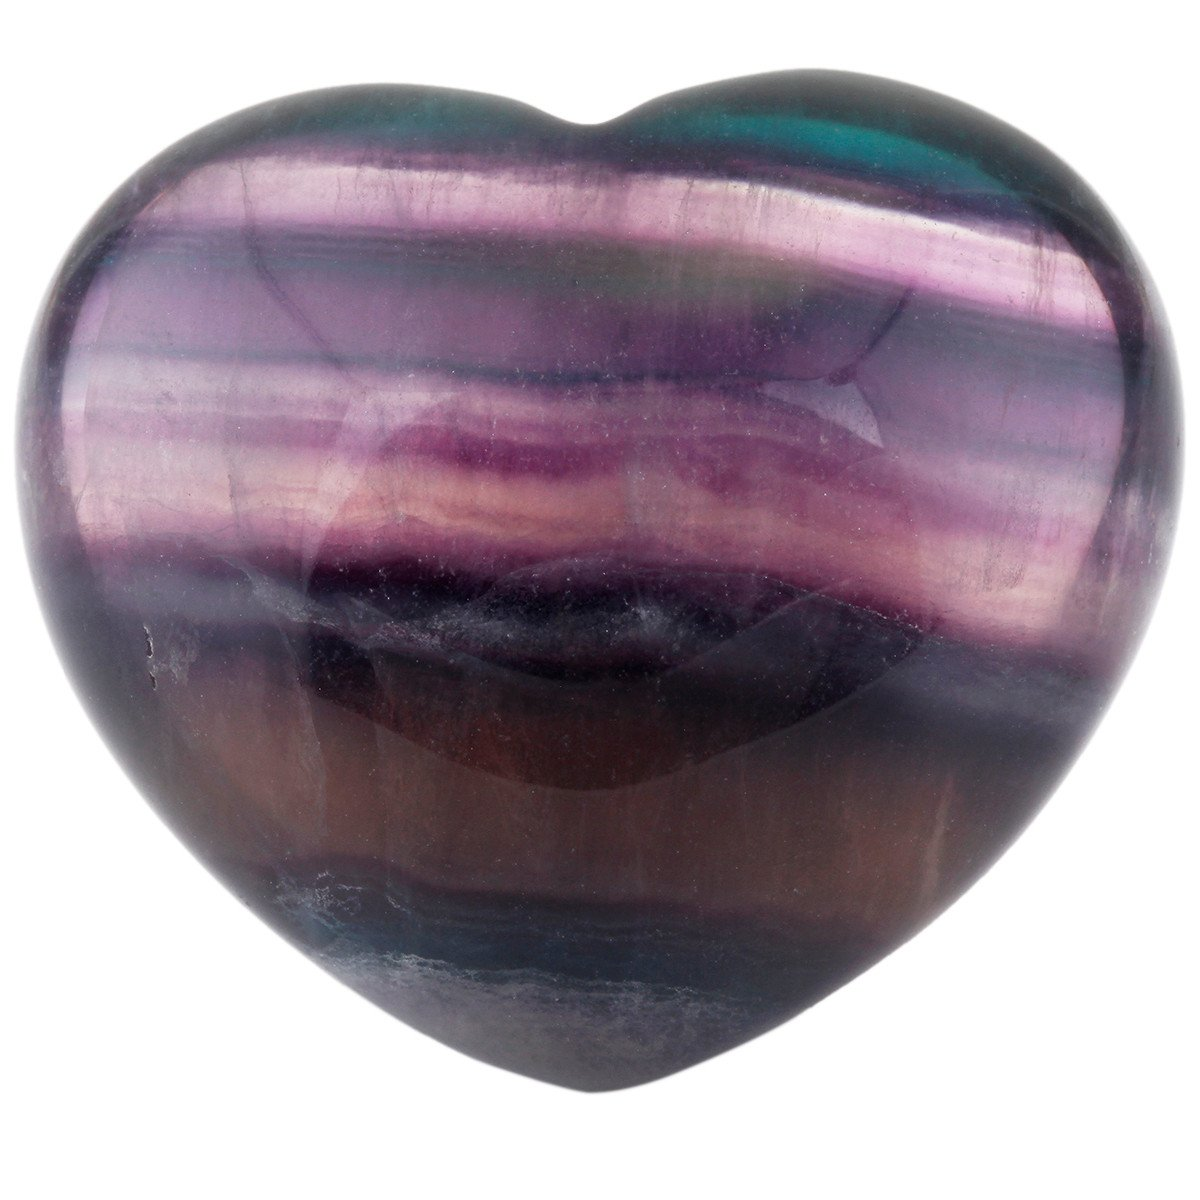 1.7 tasca pietre Palm amuleto per meditazione bilanciamento Reiki Pietra Cherry Quartz 1.7-1pcs KYEYGWO Puff Heart Healing Crystals Love pietra